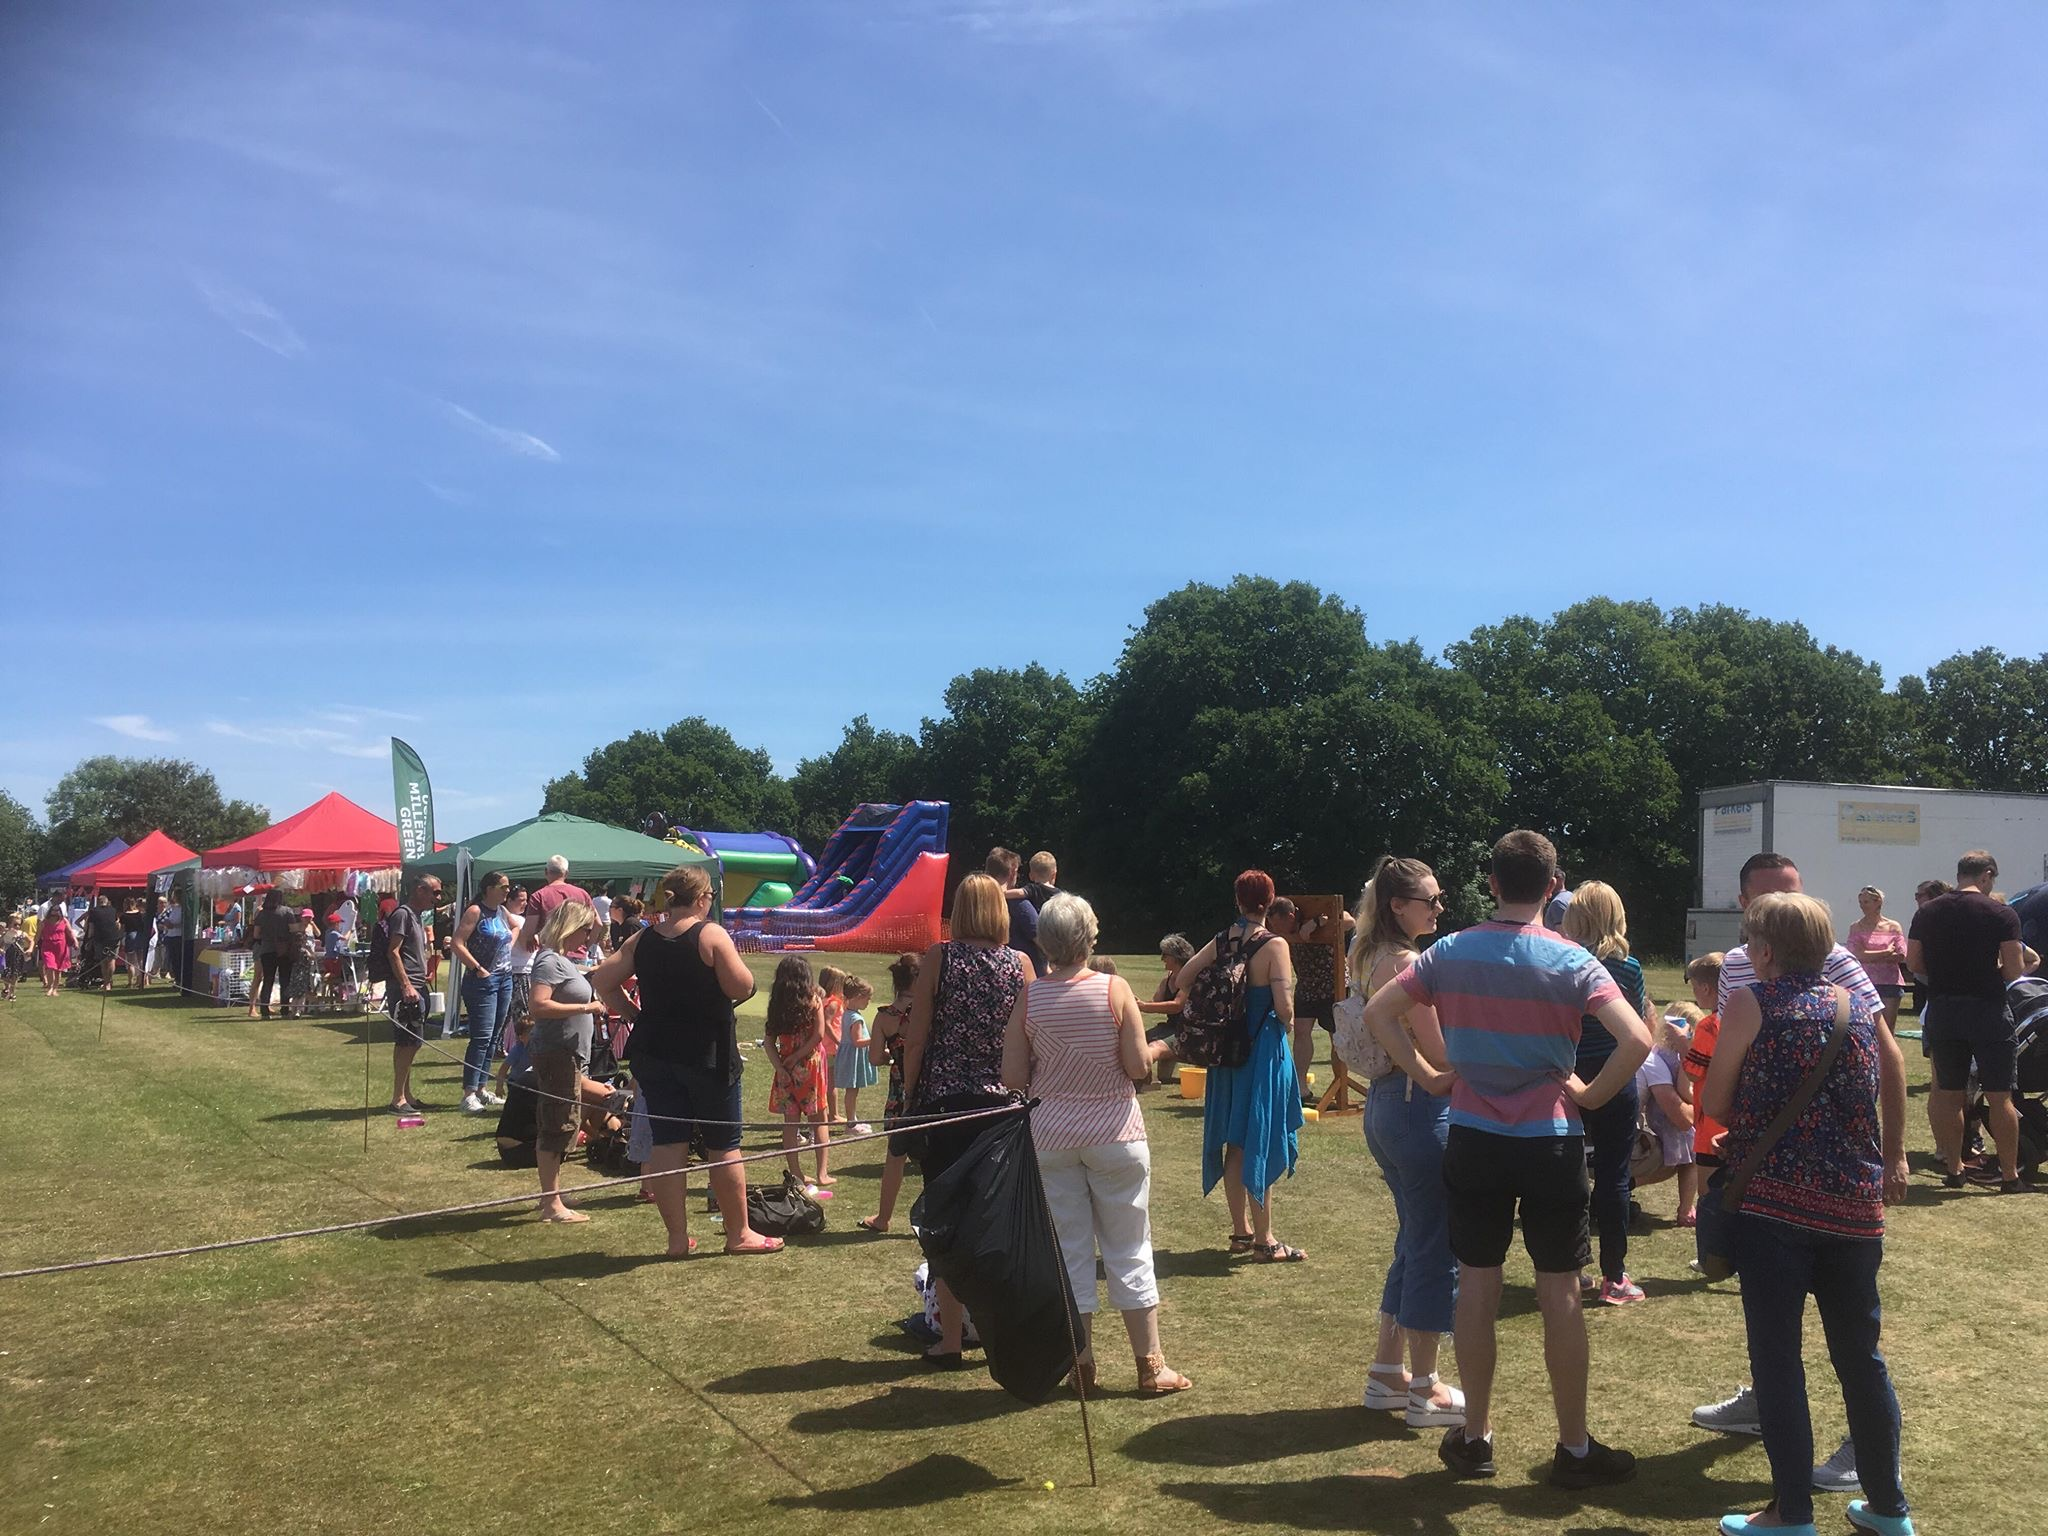 ridgewood-fair-crowds